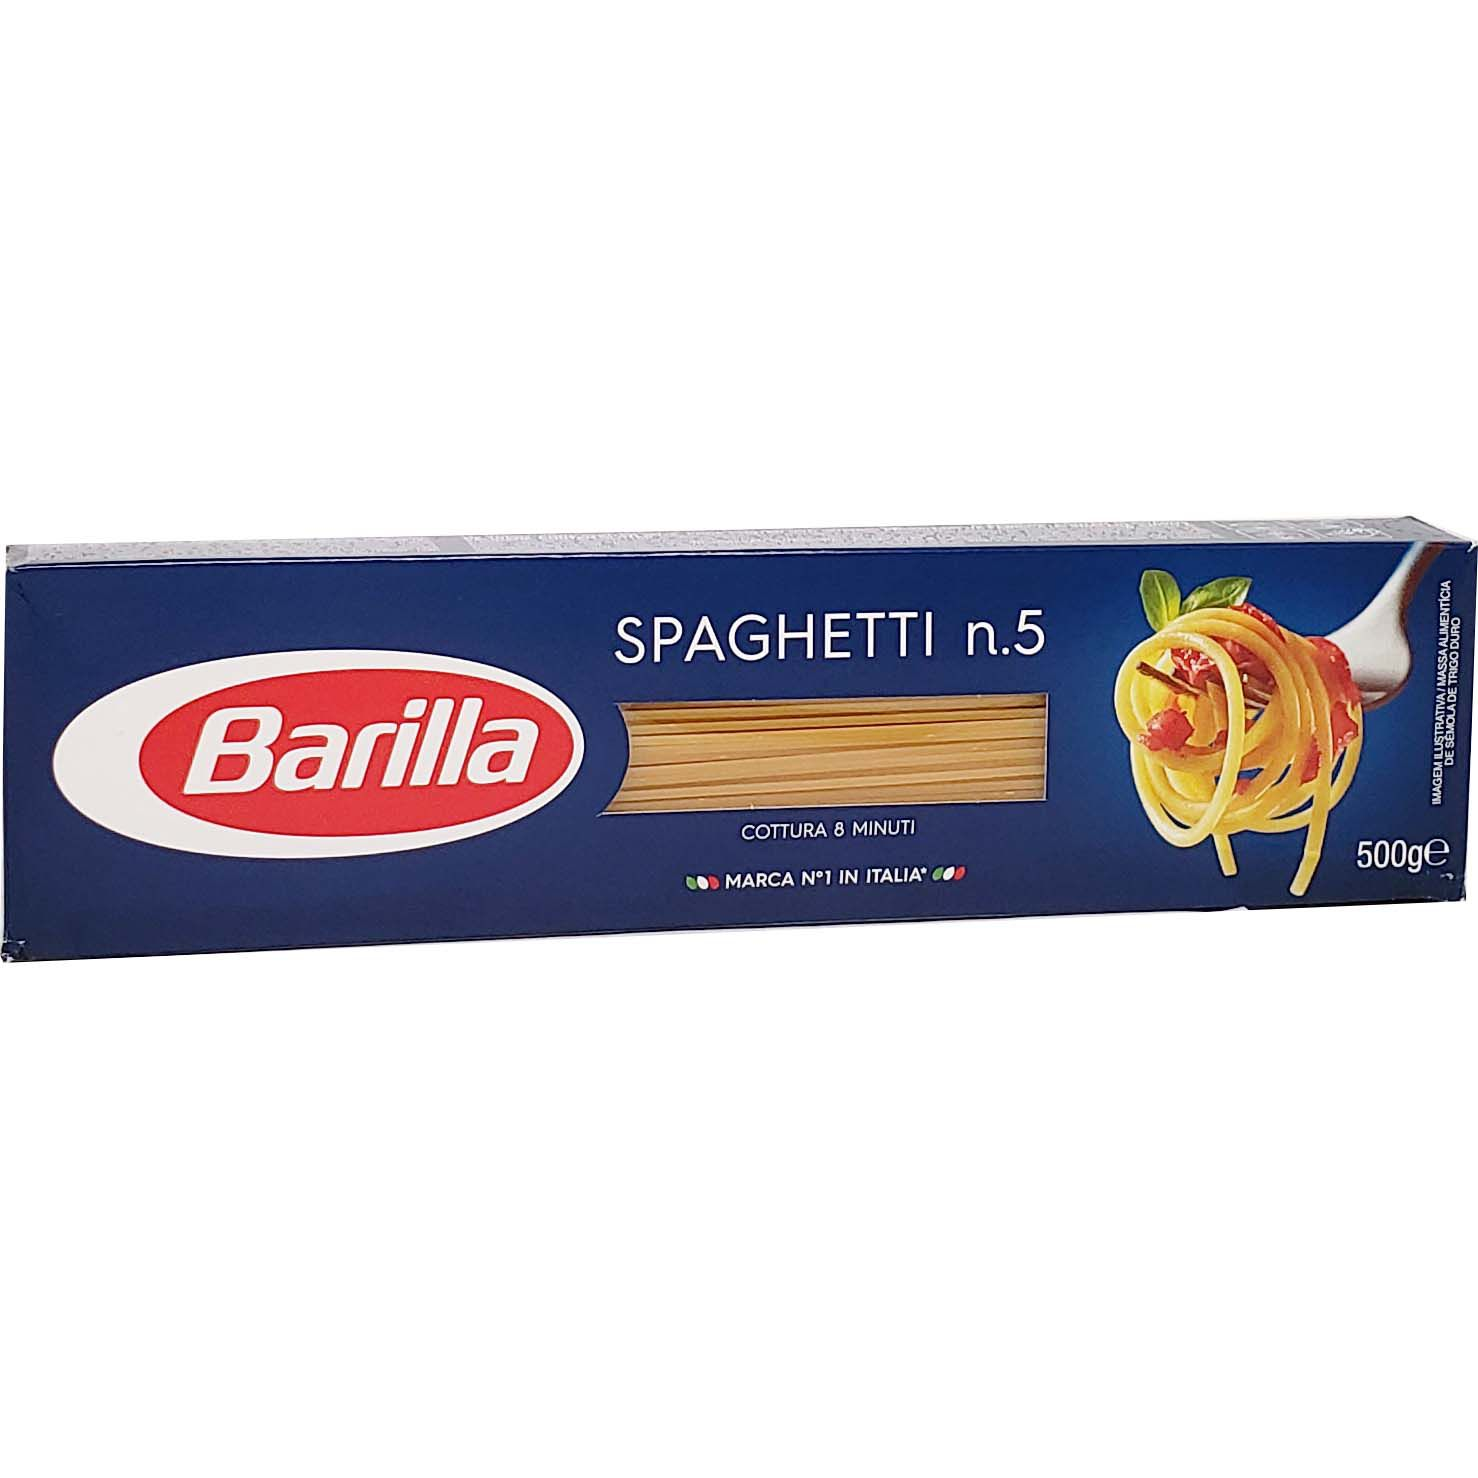 Macarrão Spaghetti n.5 Barilla - 500g -